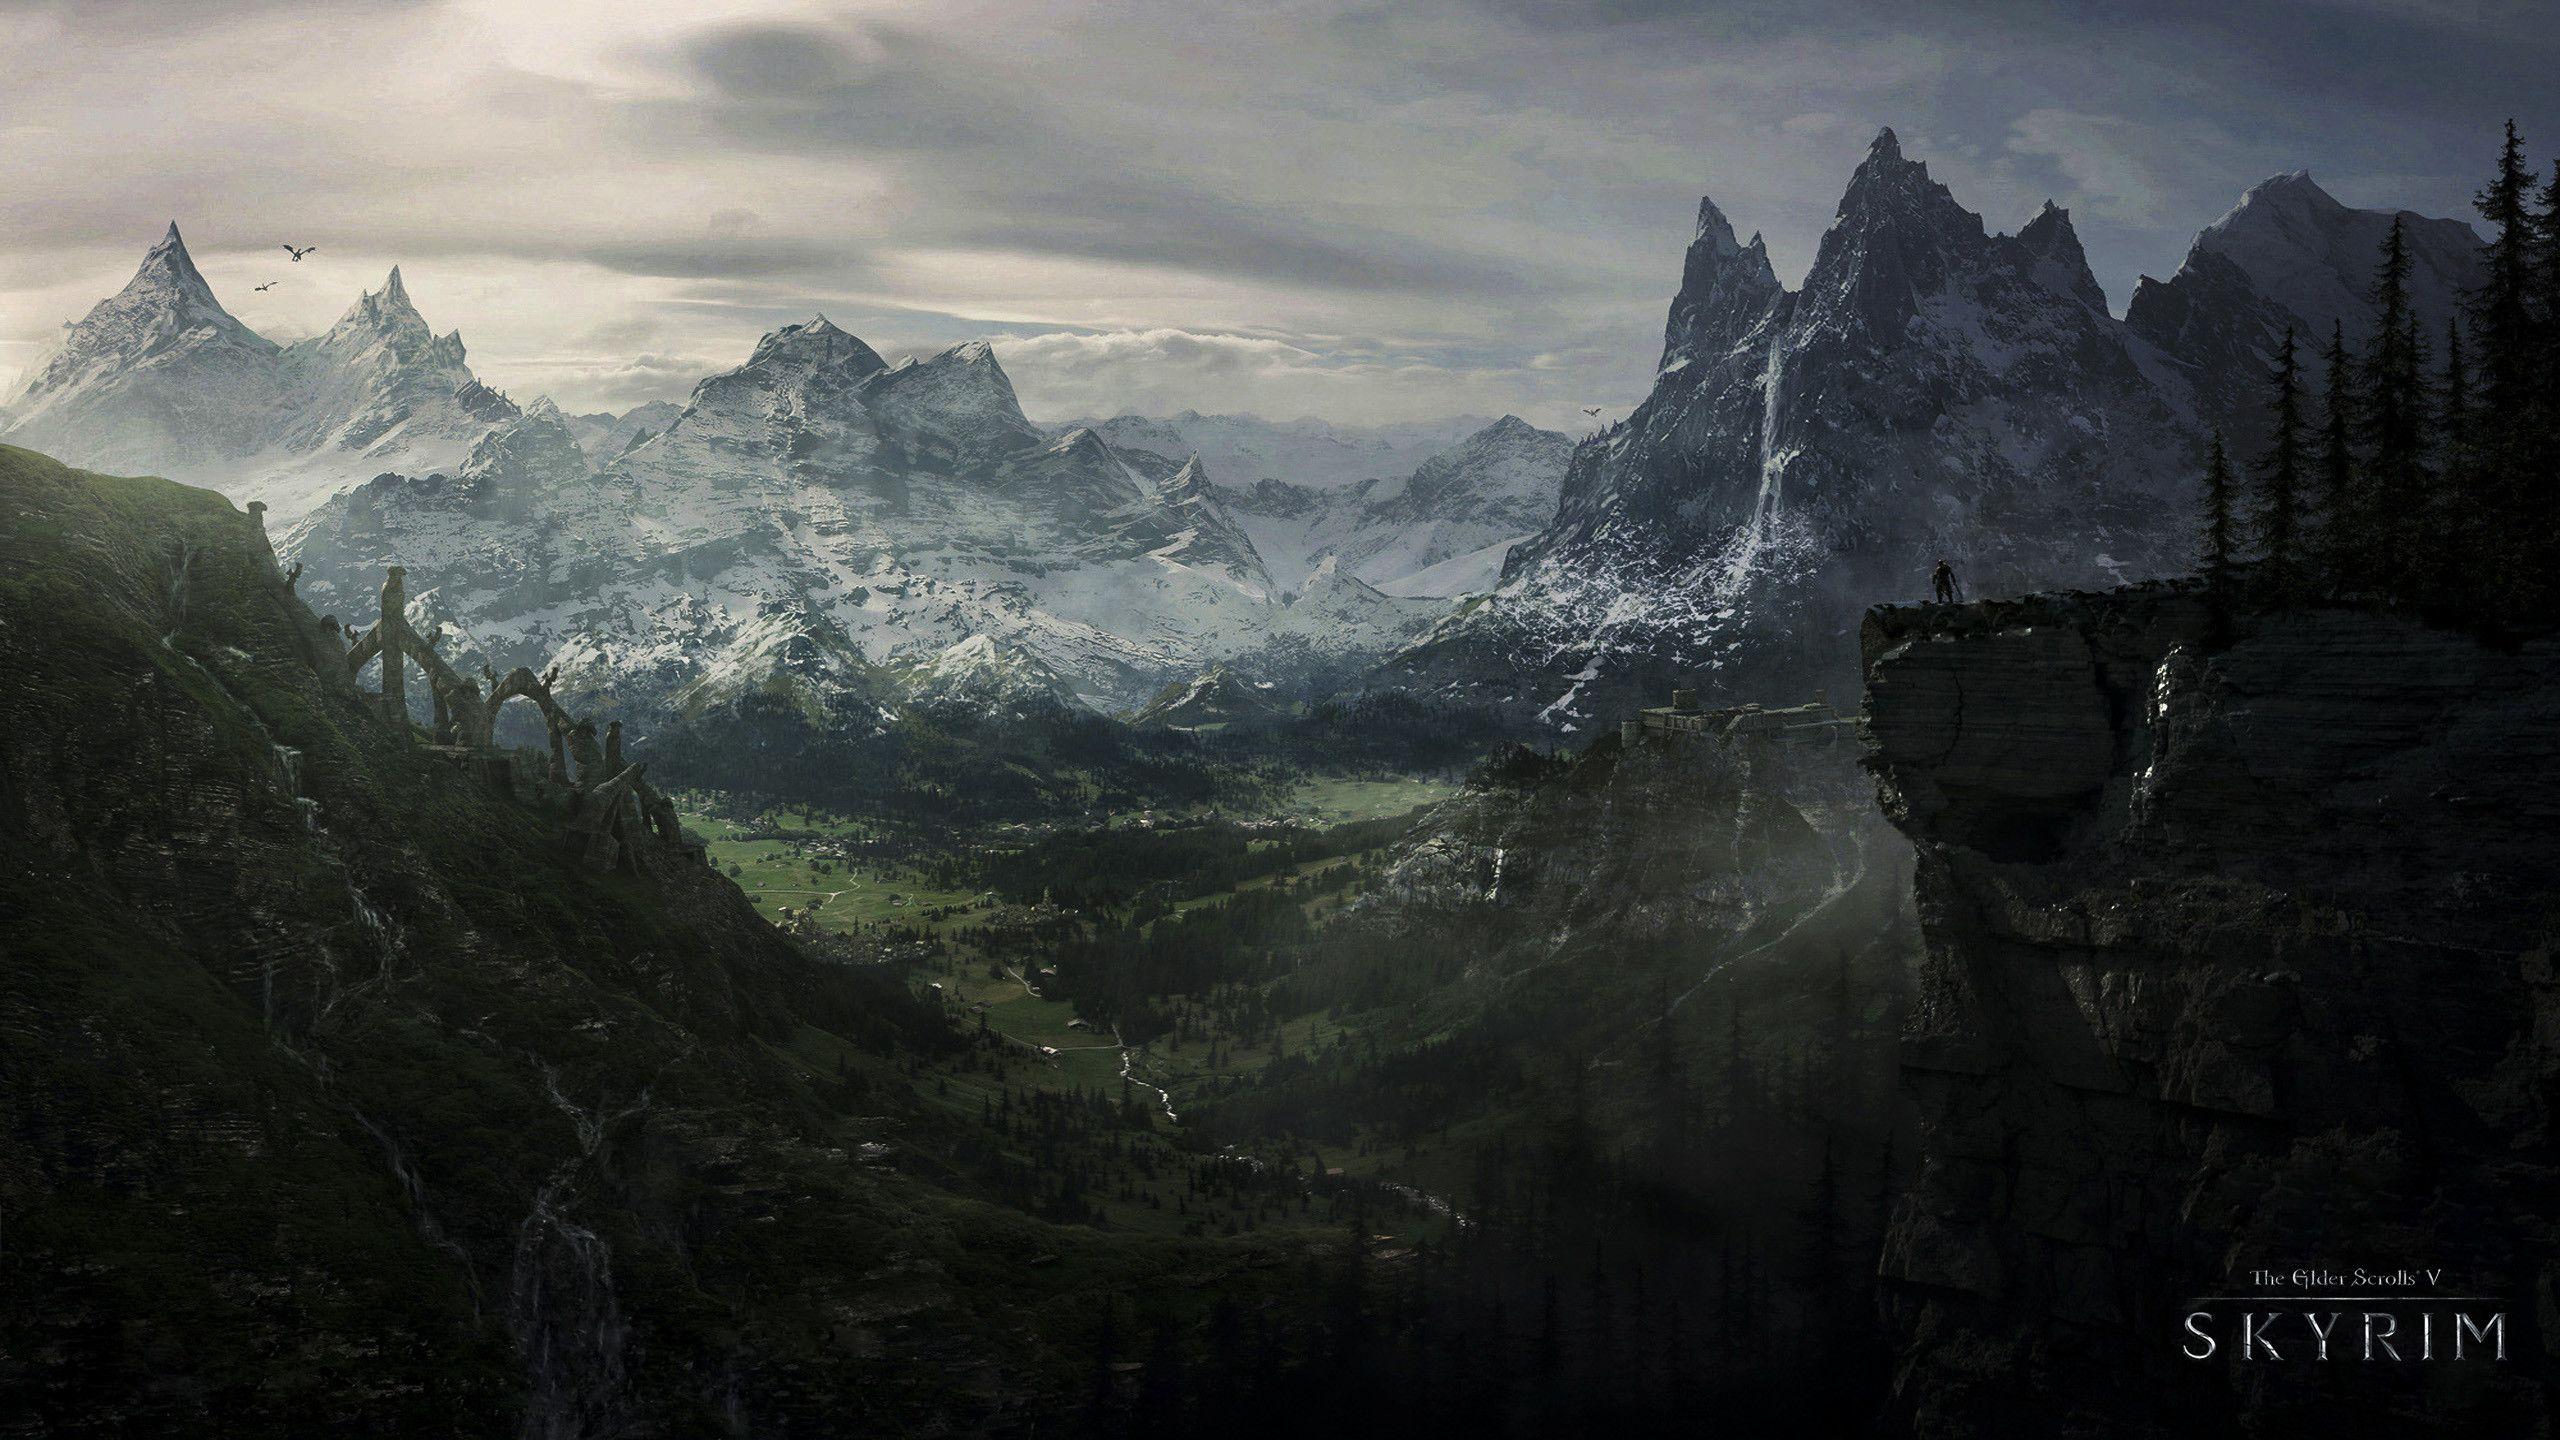 Skyrim 4K Wallpapers   Top Skyrim 4K Backgrounds 2560x1440